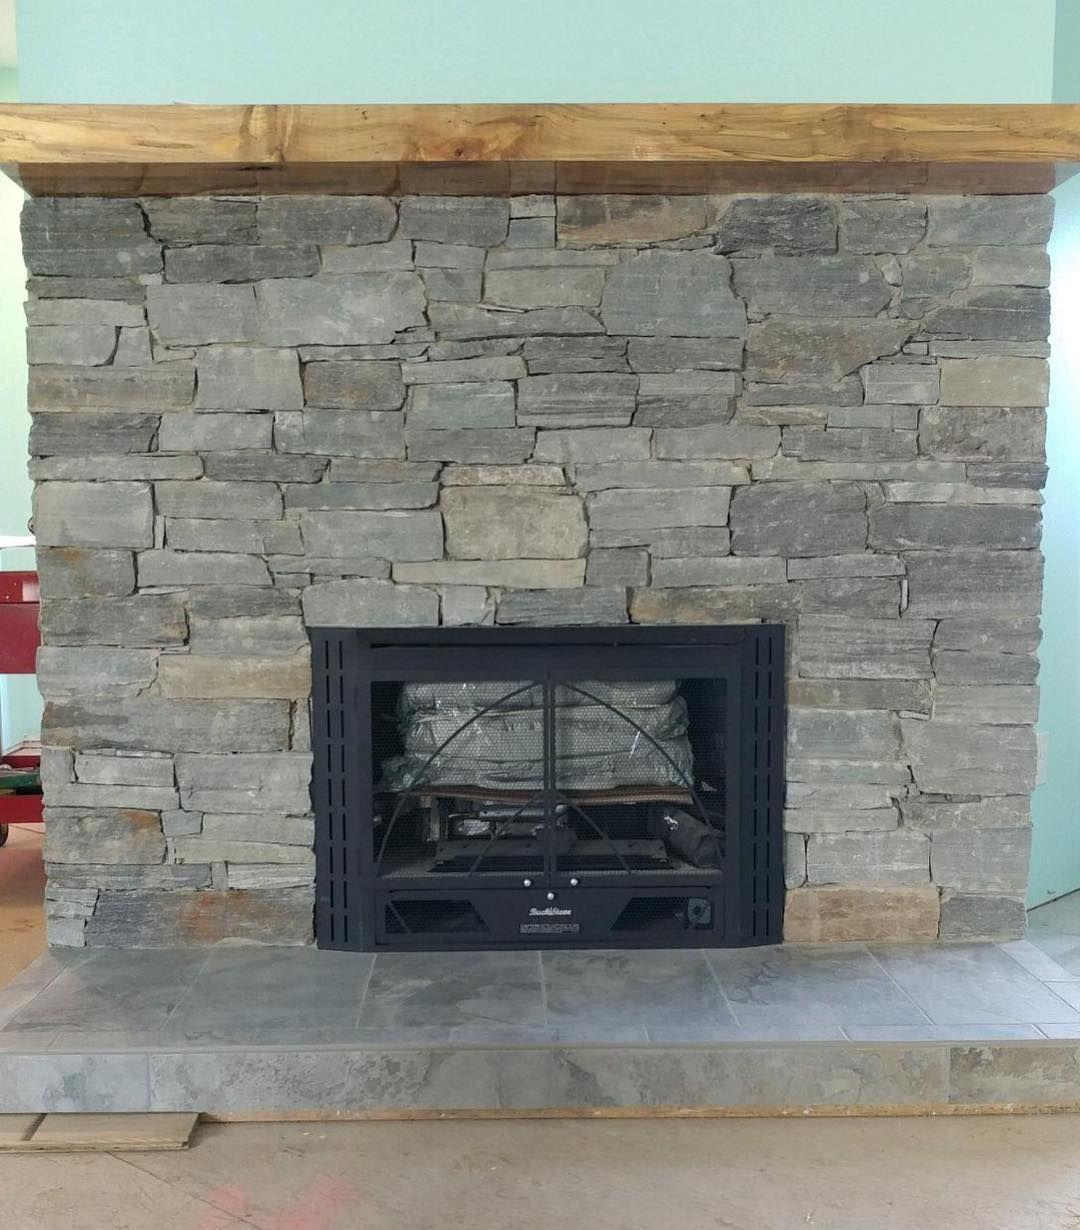 Sheffield Natural Stone Veneer Fireplace